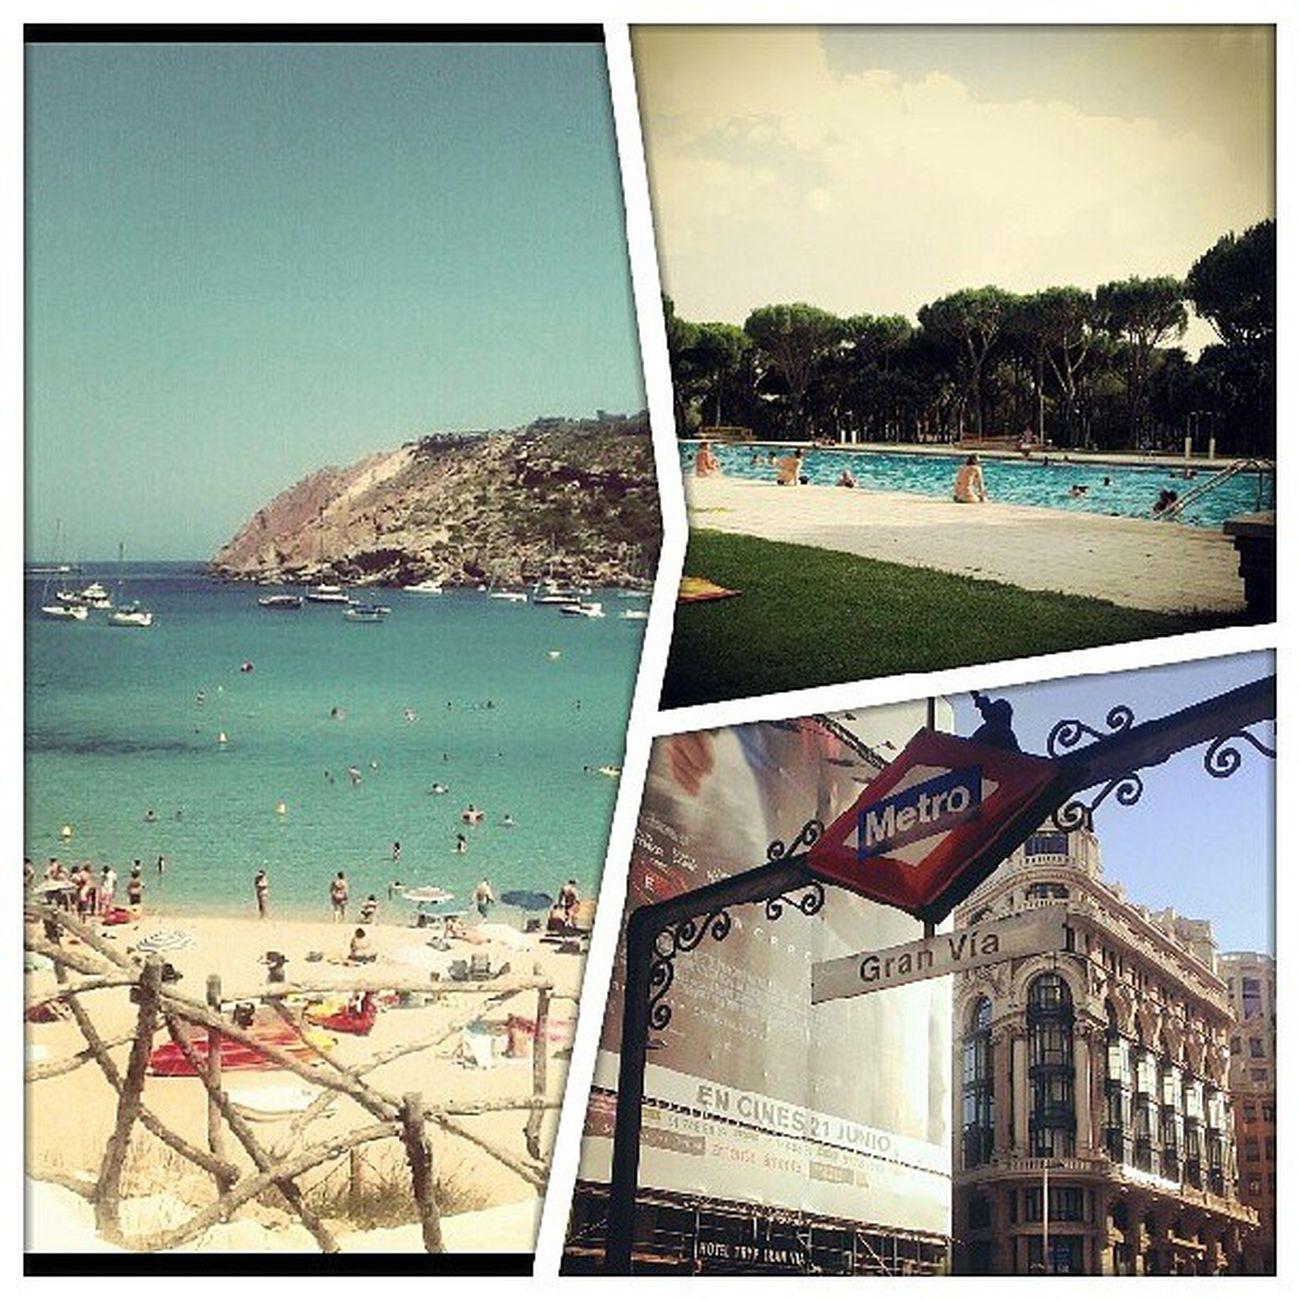 Que buen veranito me espera.... Montico Madrid Menorca :3